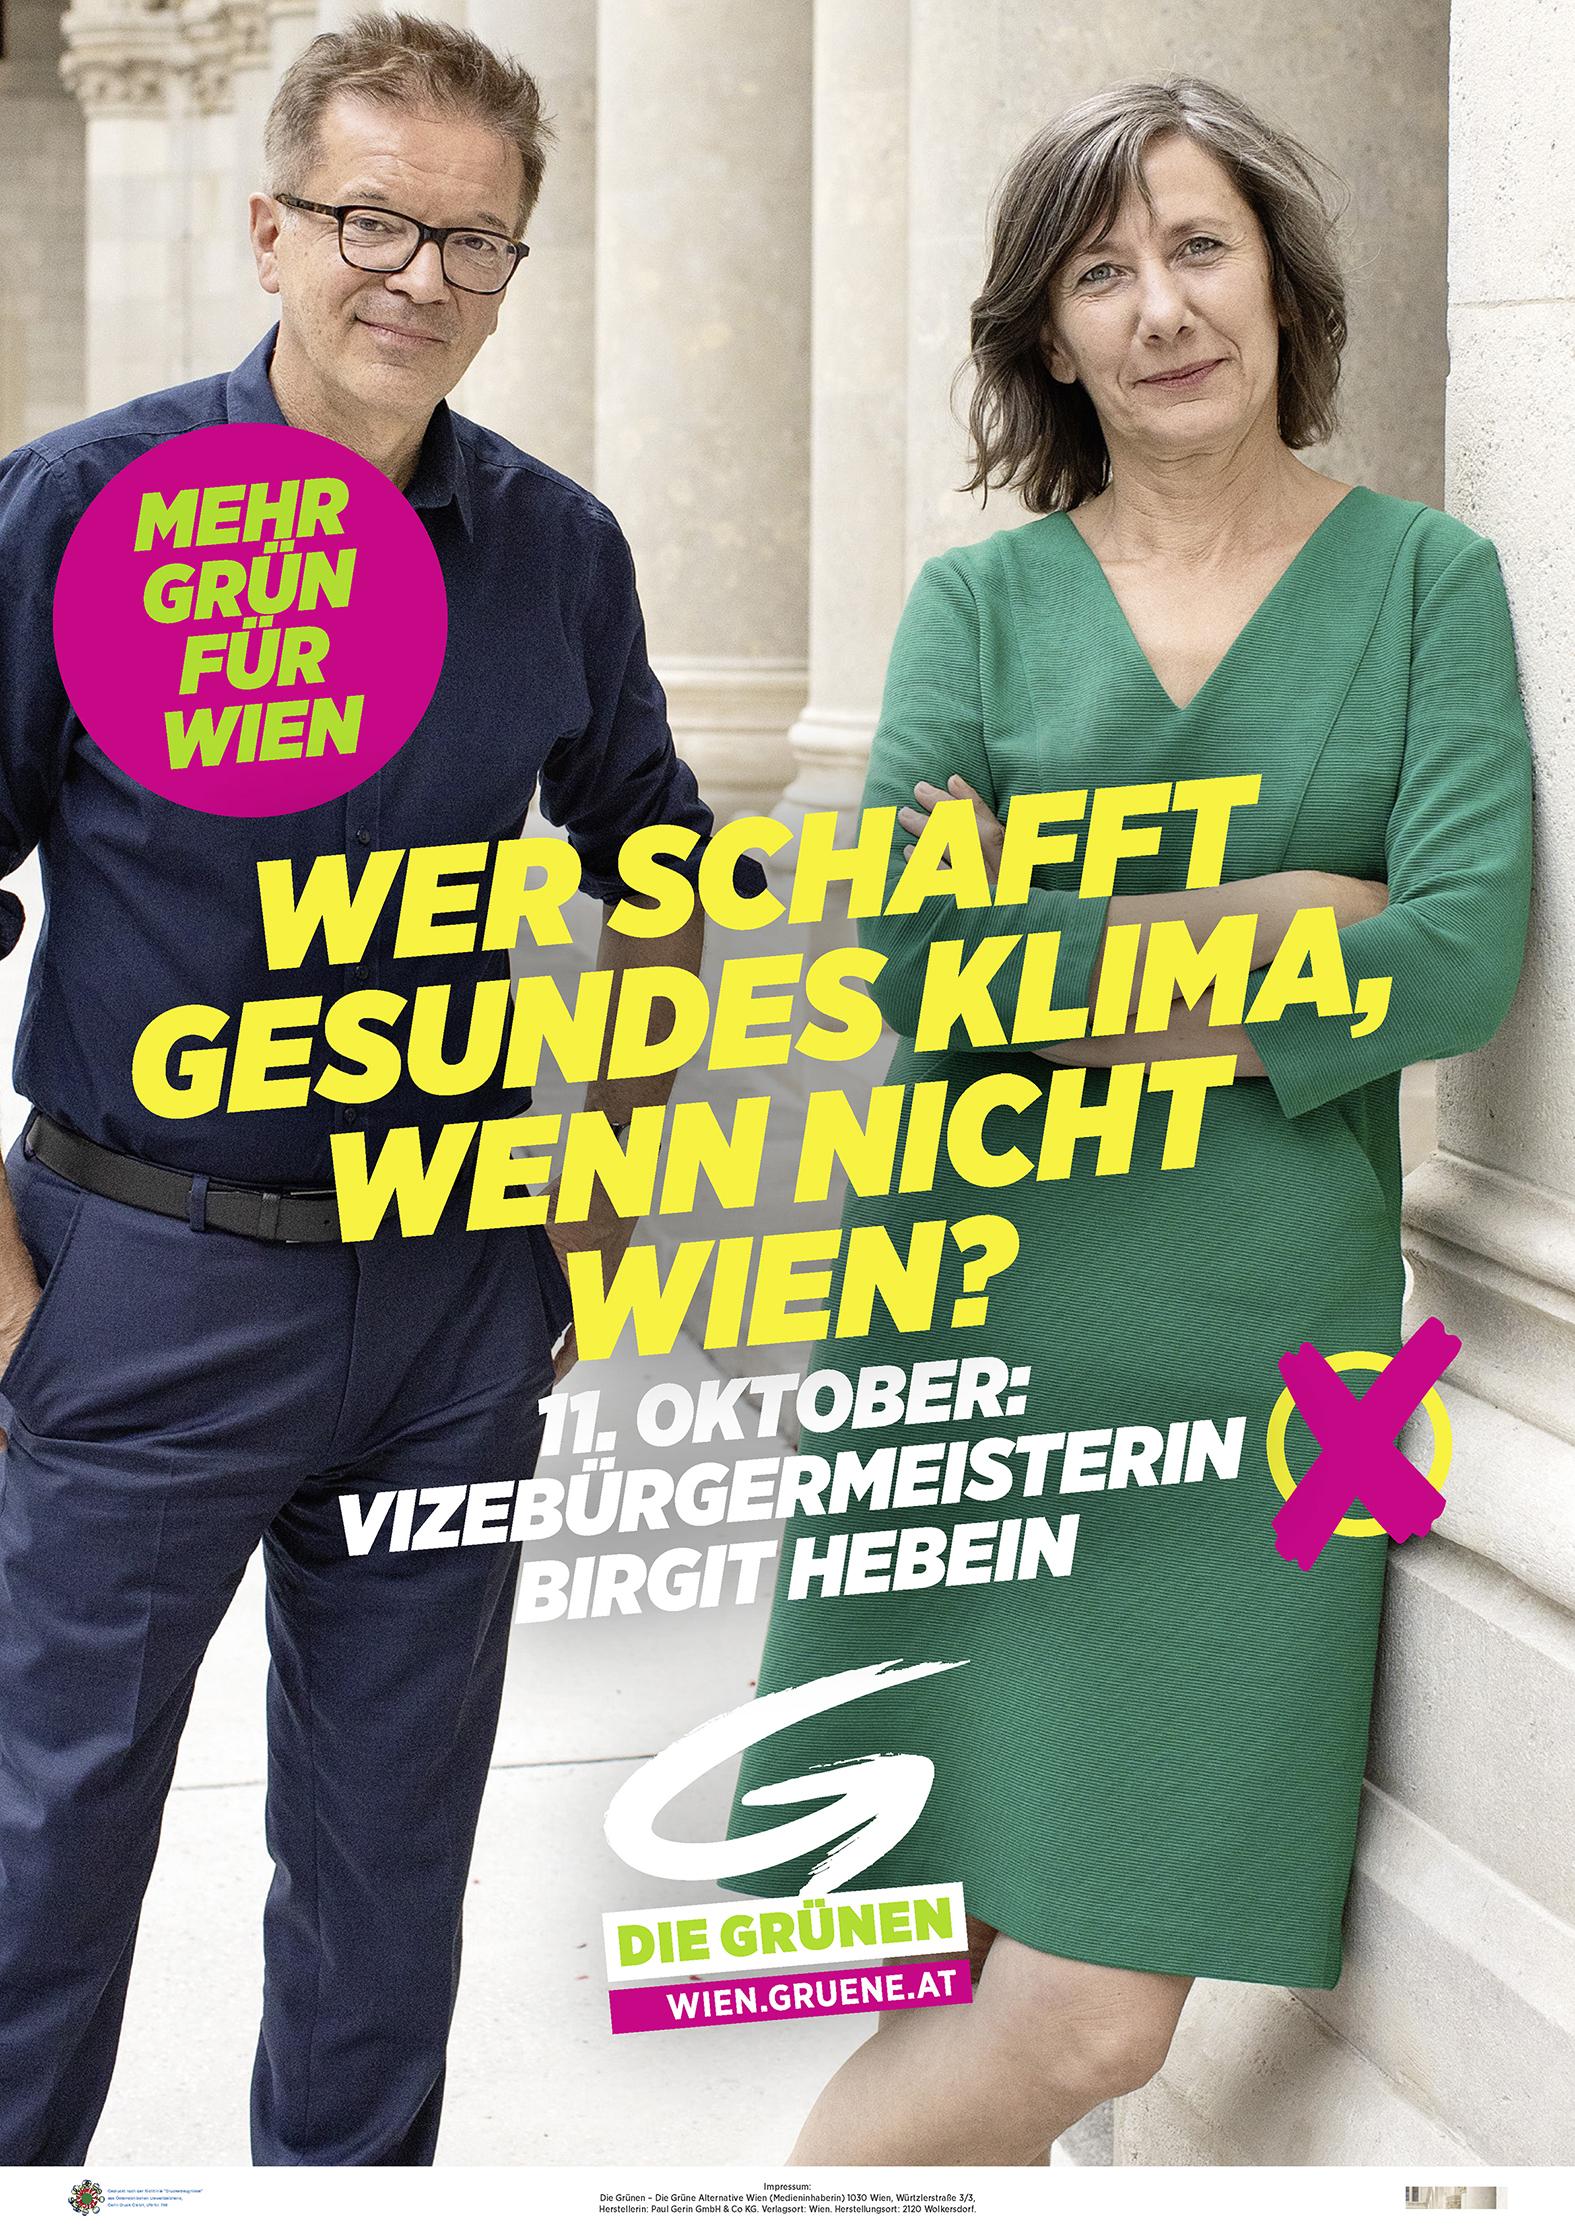 Gruene-Plakate-gesundes-Klima-A3jpg